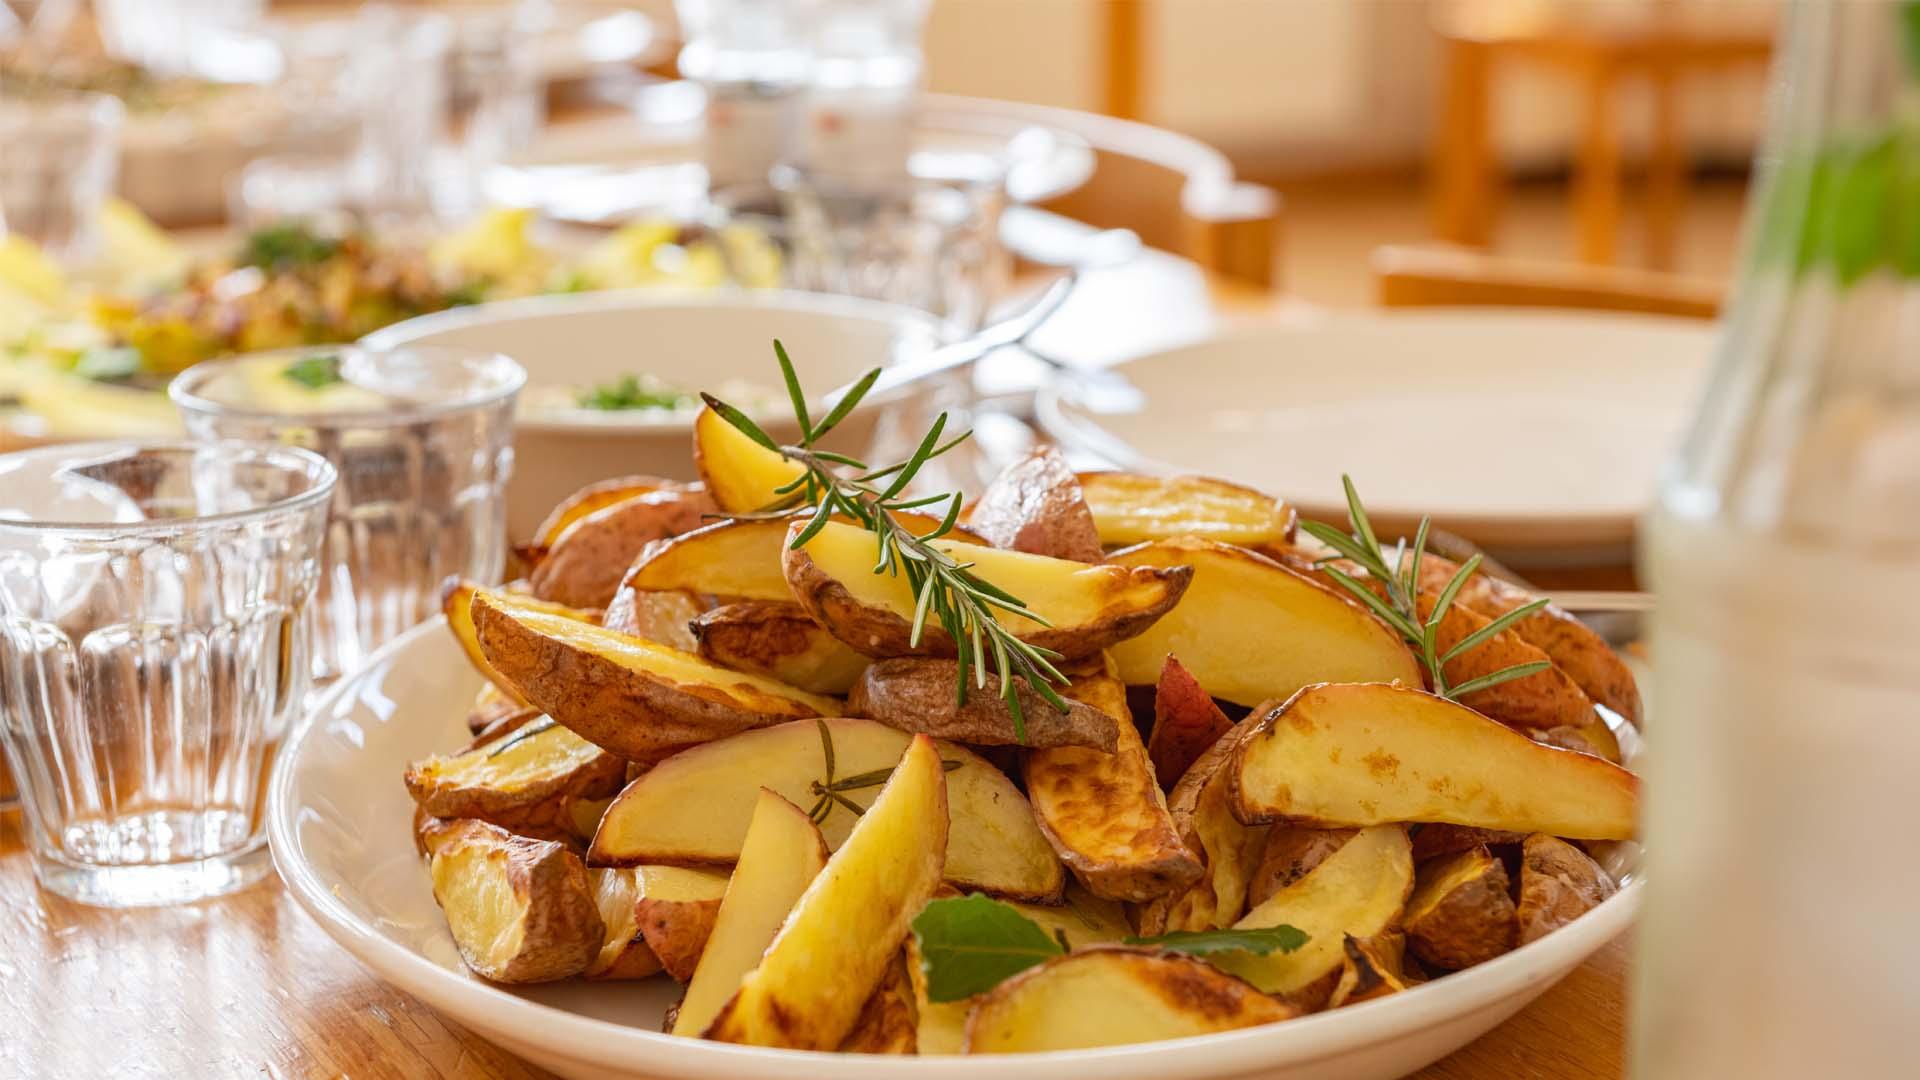 Diner aardappeltjes share dinner gezond biologisch duurzaam